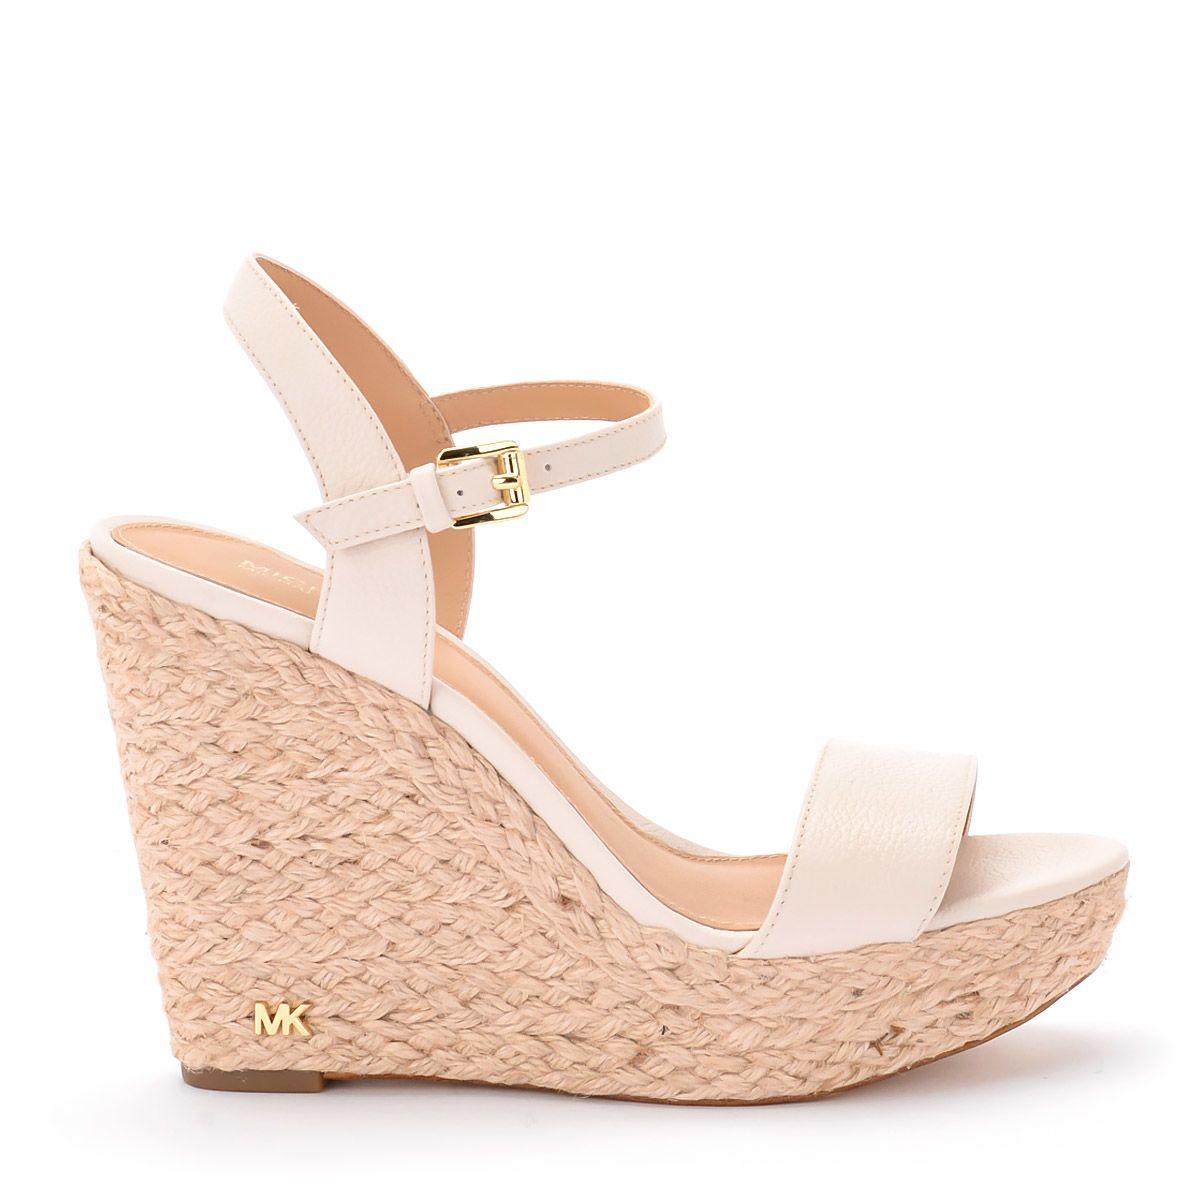 Michael Kors Jill Ivory Leather Wedge Sandal